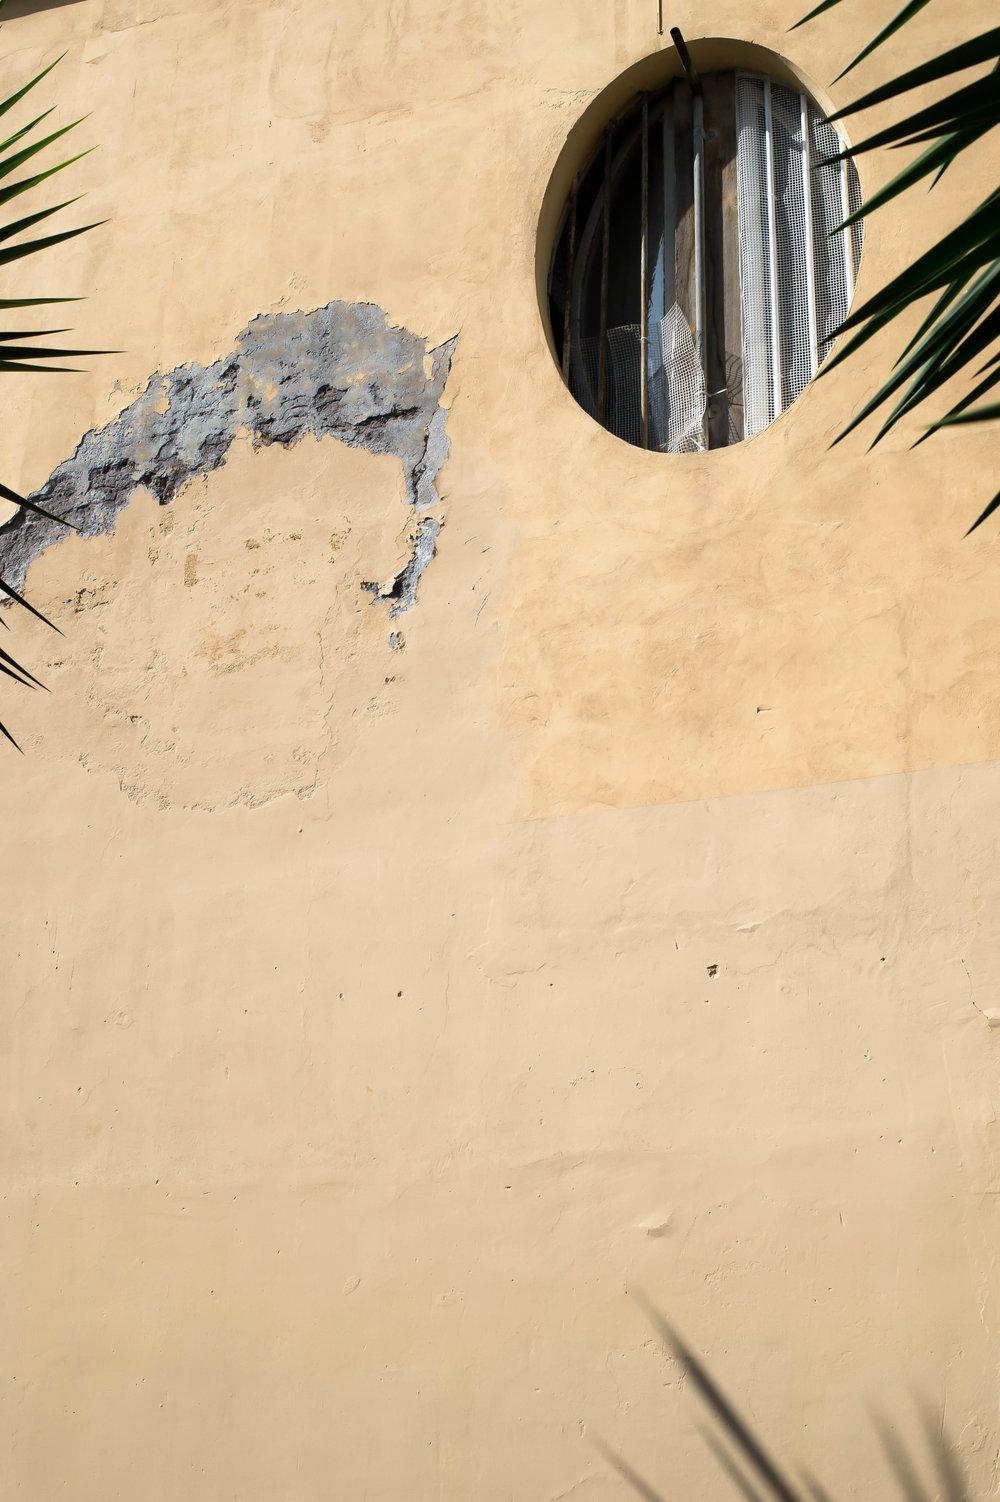 2015_09_19 roma_italia garbatella palms 1 V2.jpg